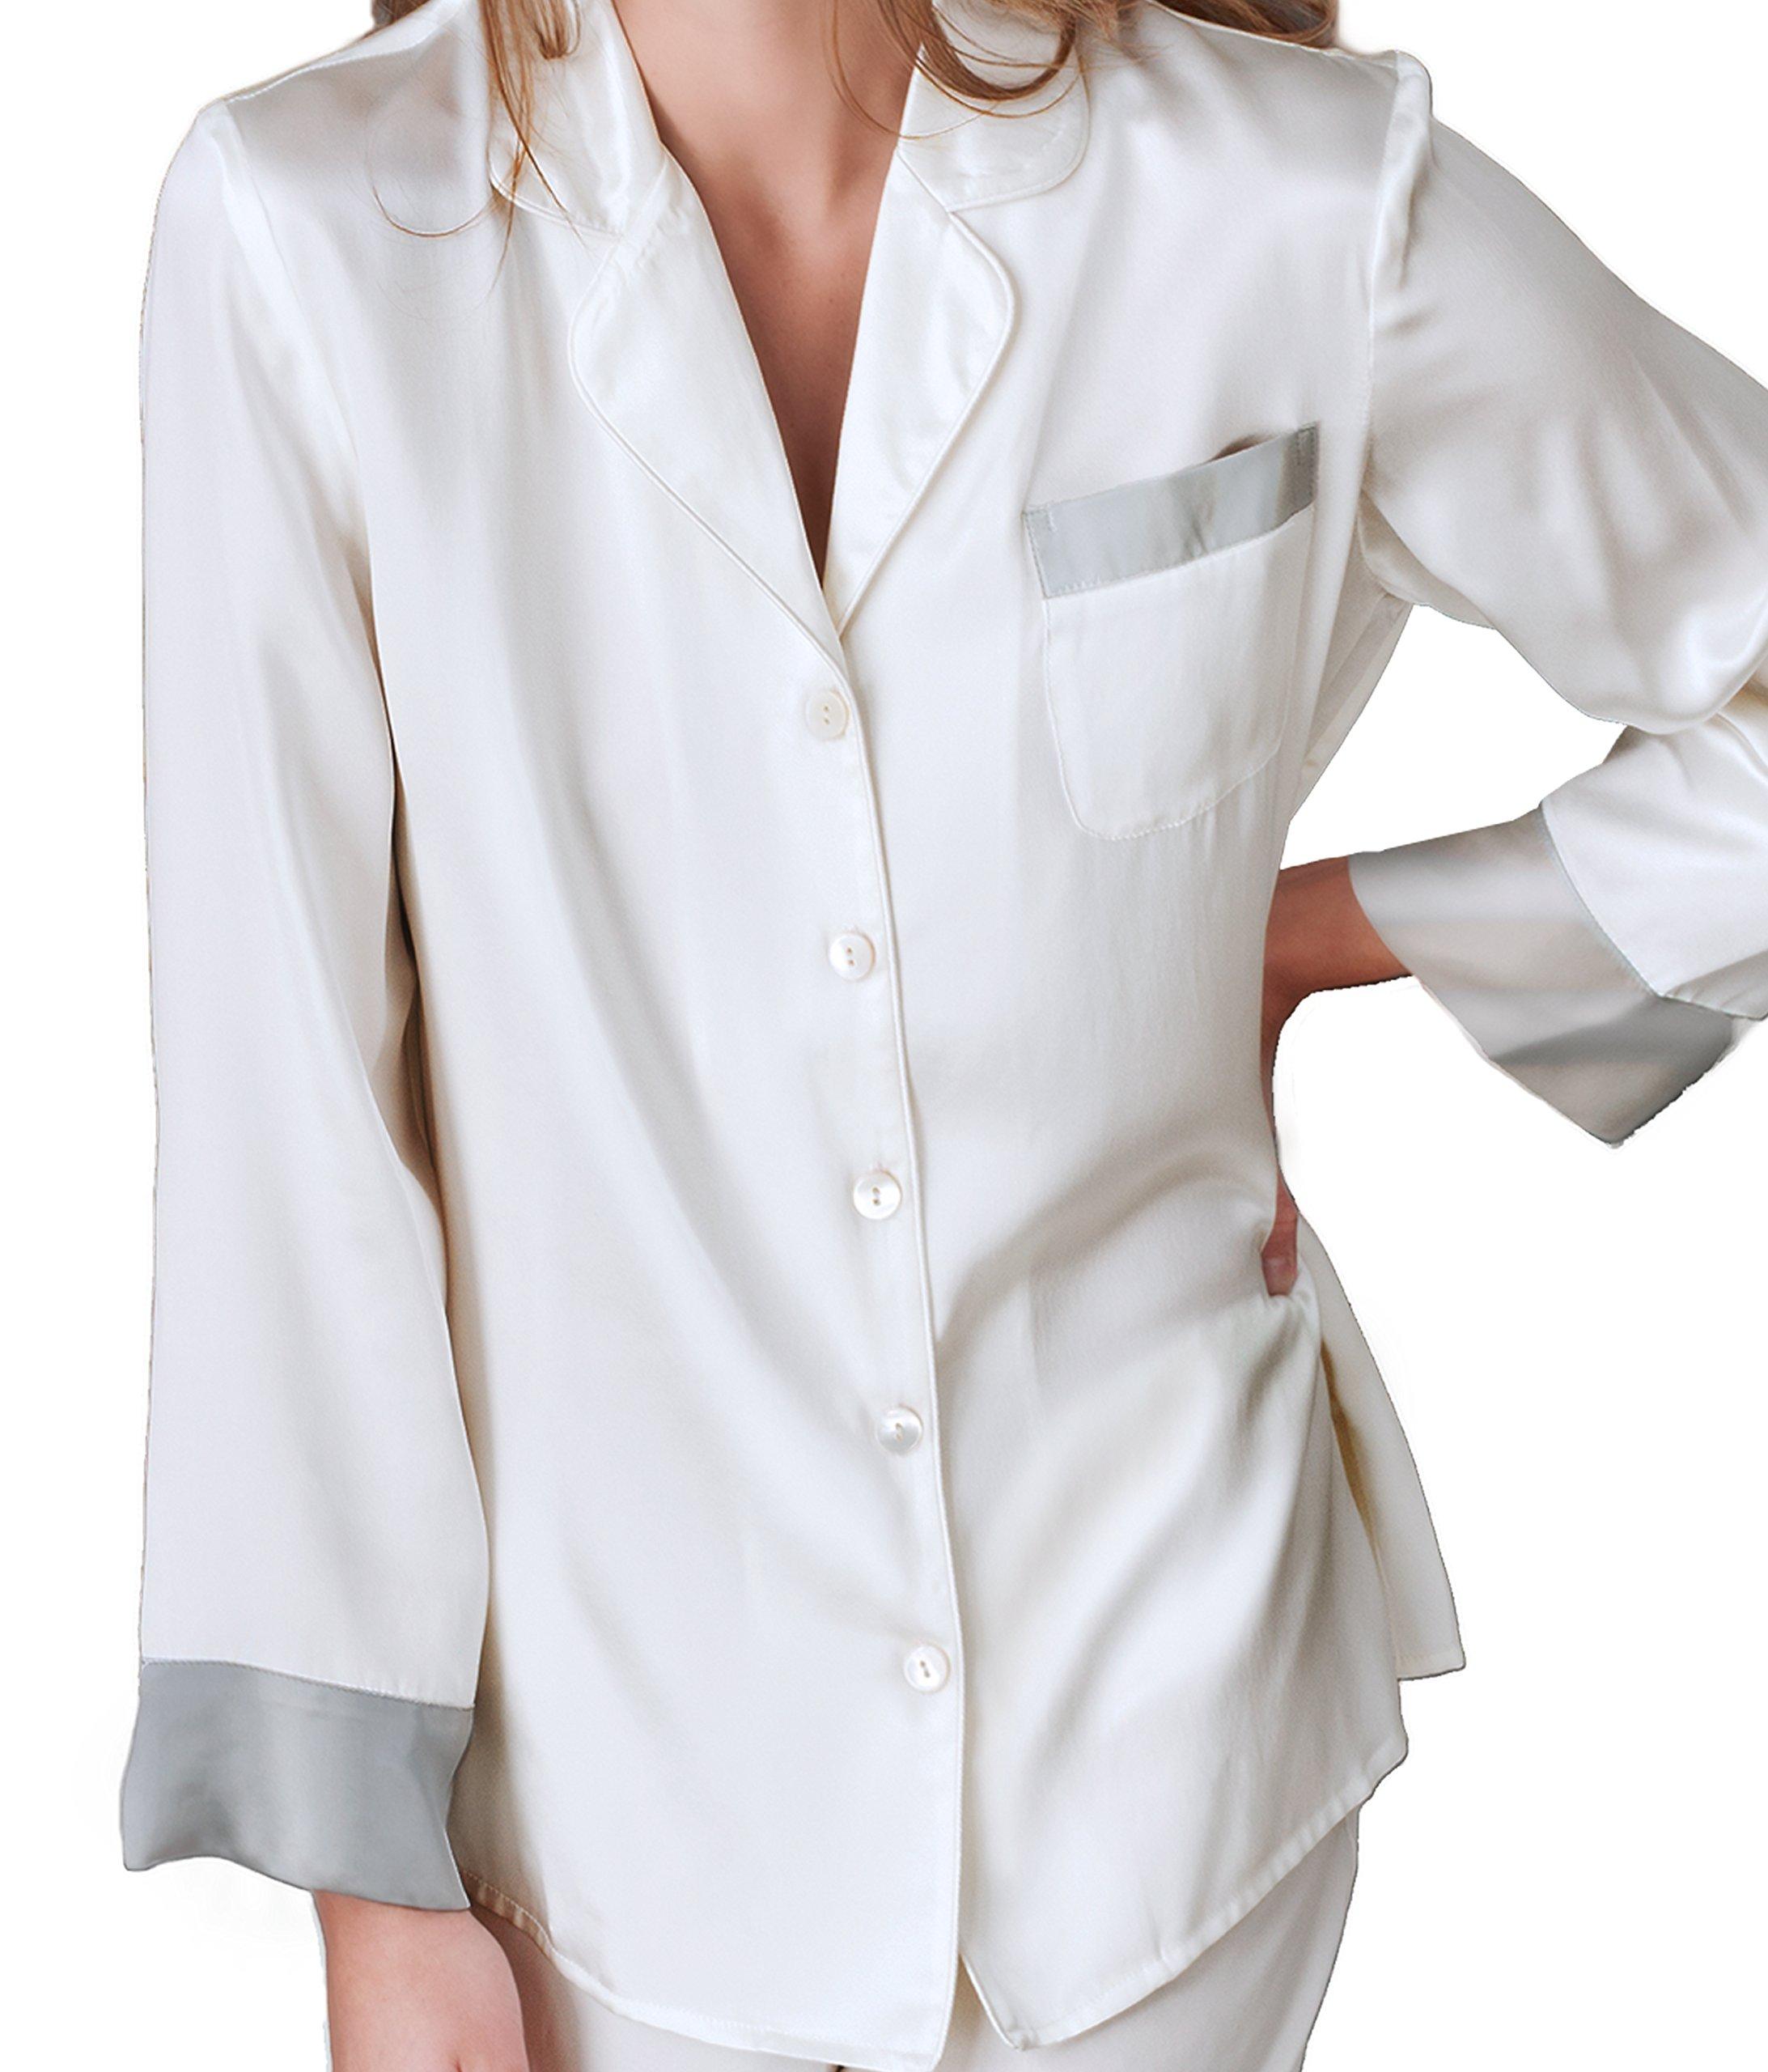 Julianna Rae Women's 100% Silk Pajama, Classic Fit, Evening Lounge, Alabaster, Petite, M by Julianna Rae (Image #2)